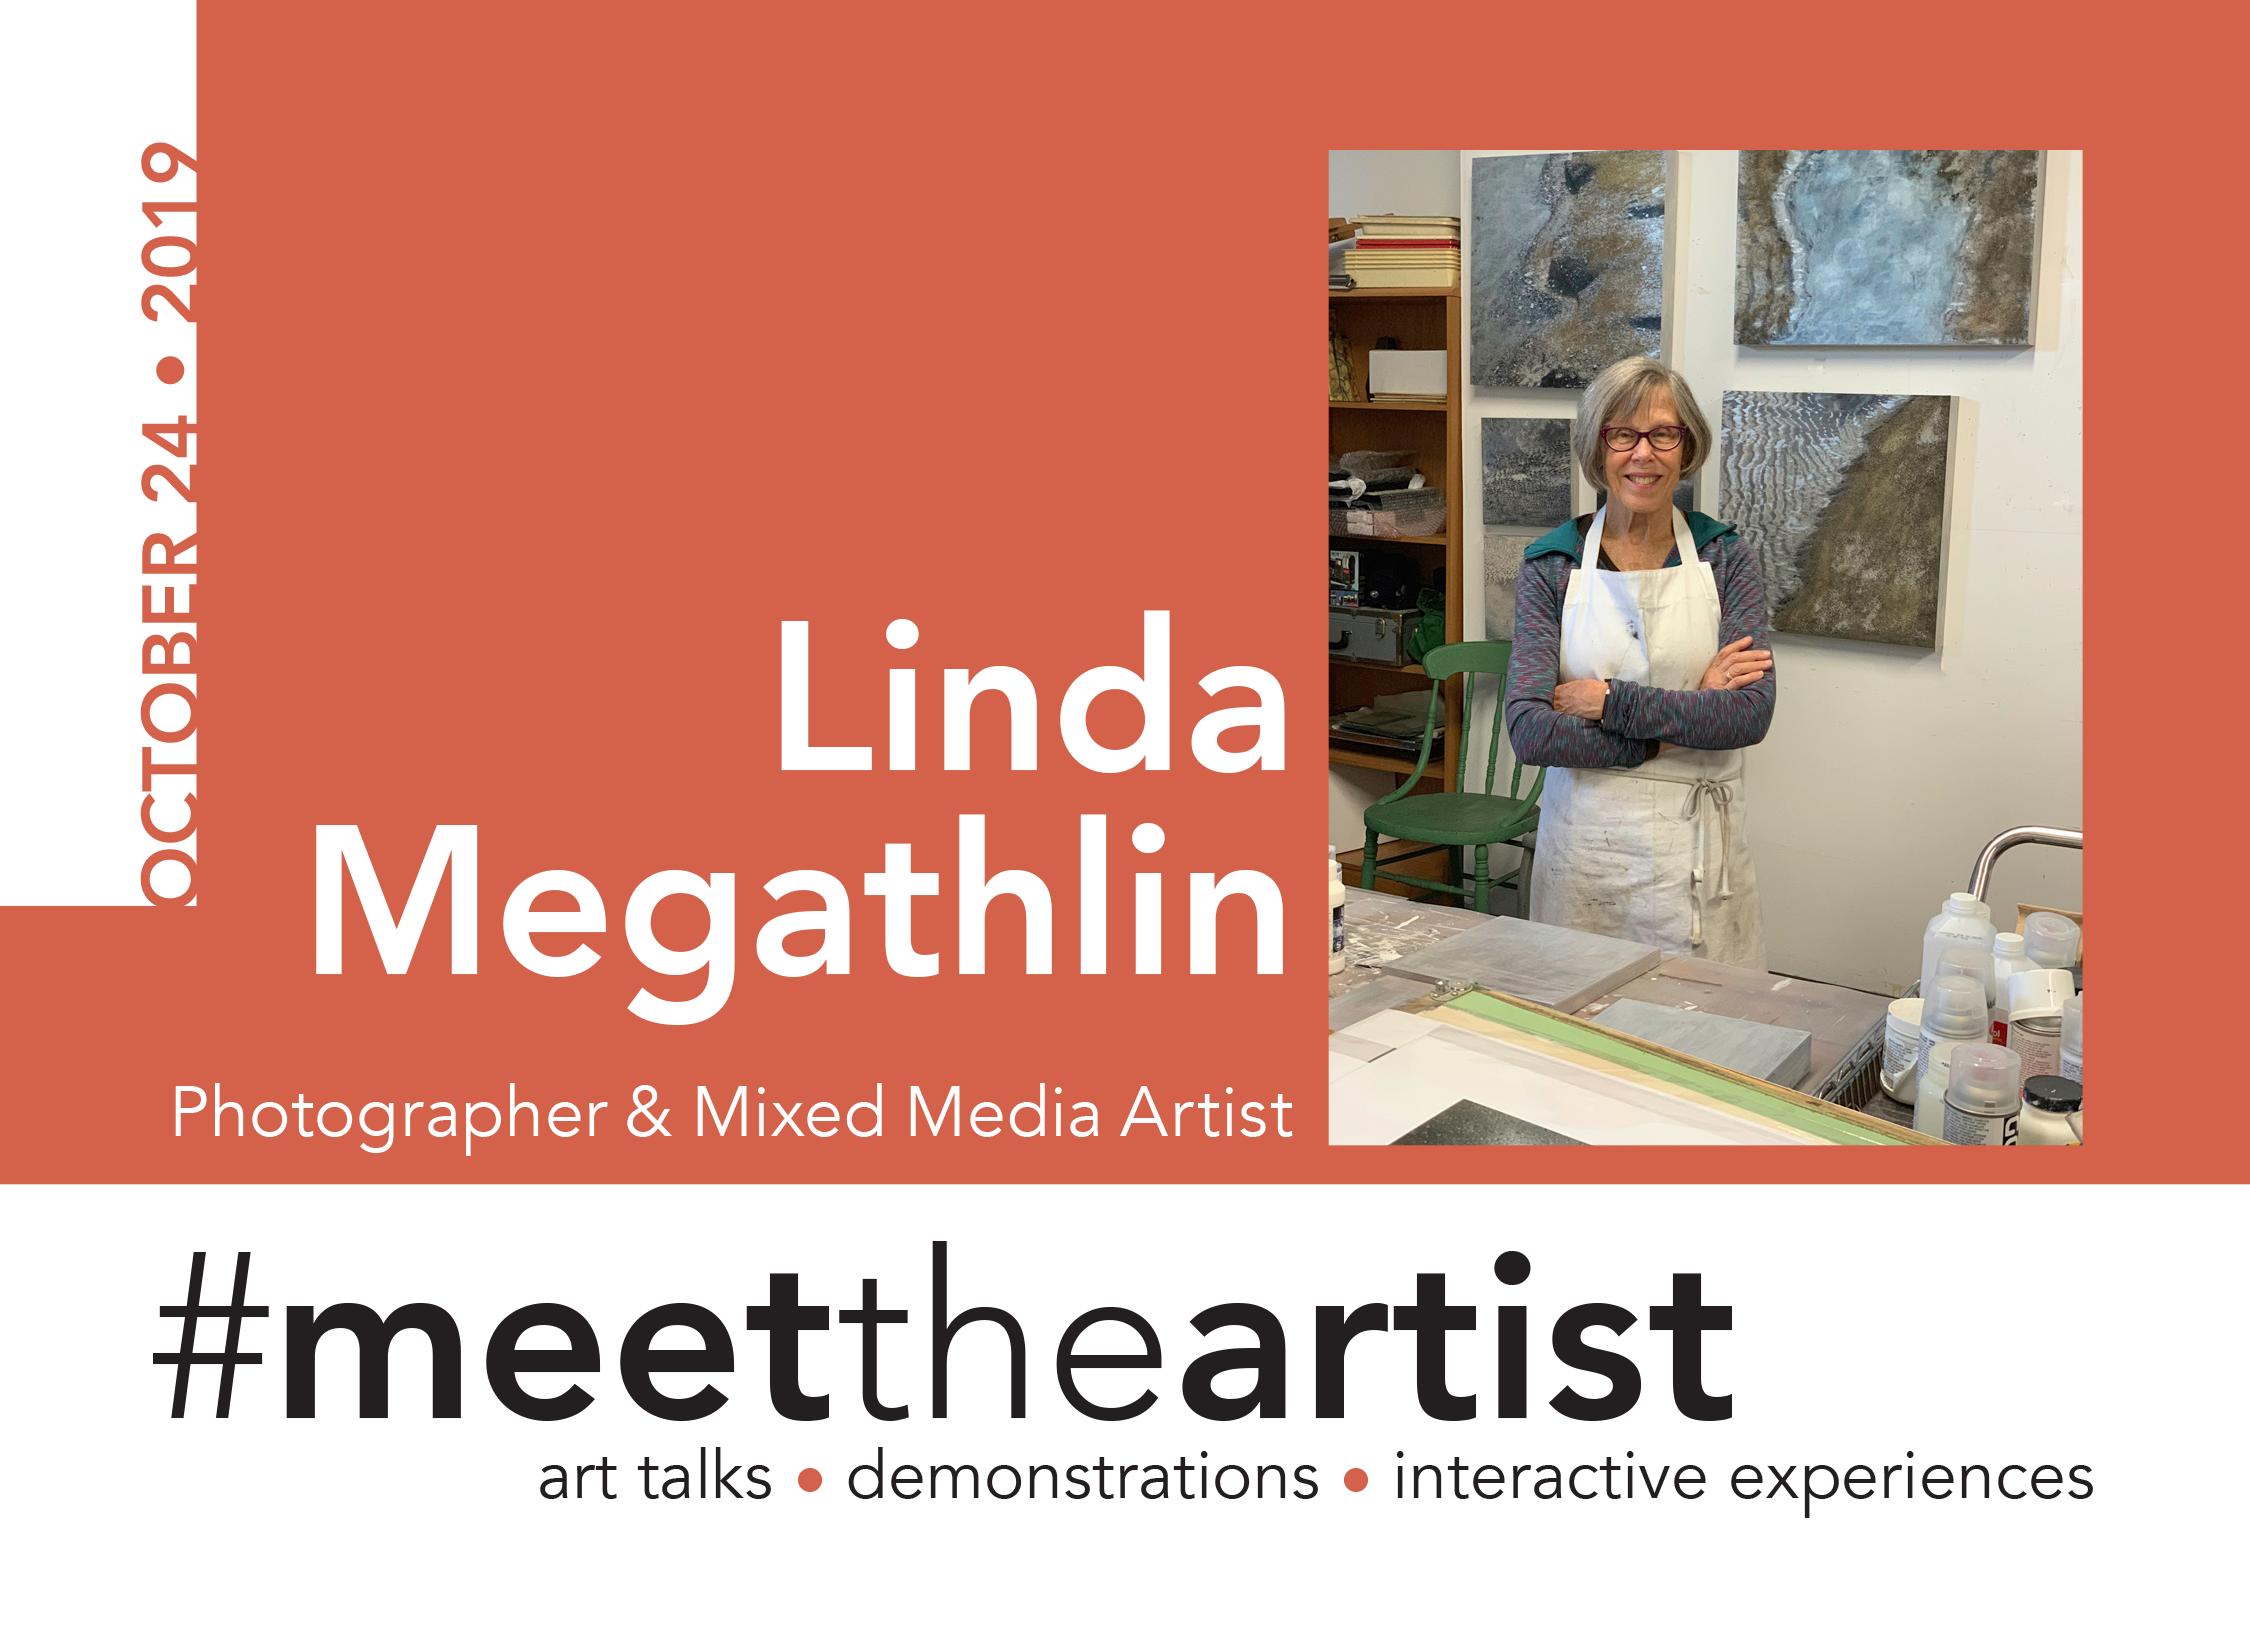 #meettheartist Linda Megathlin